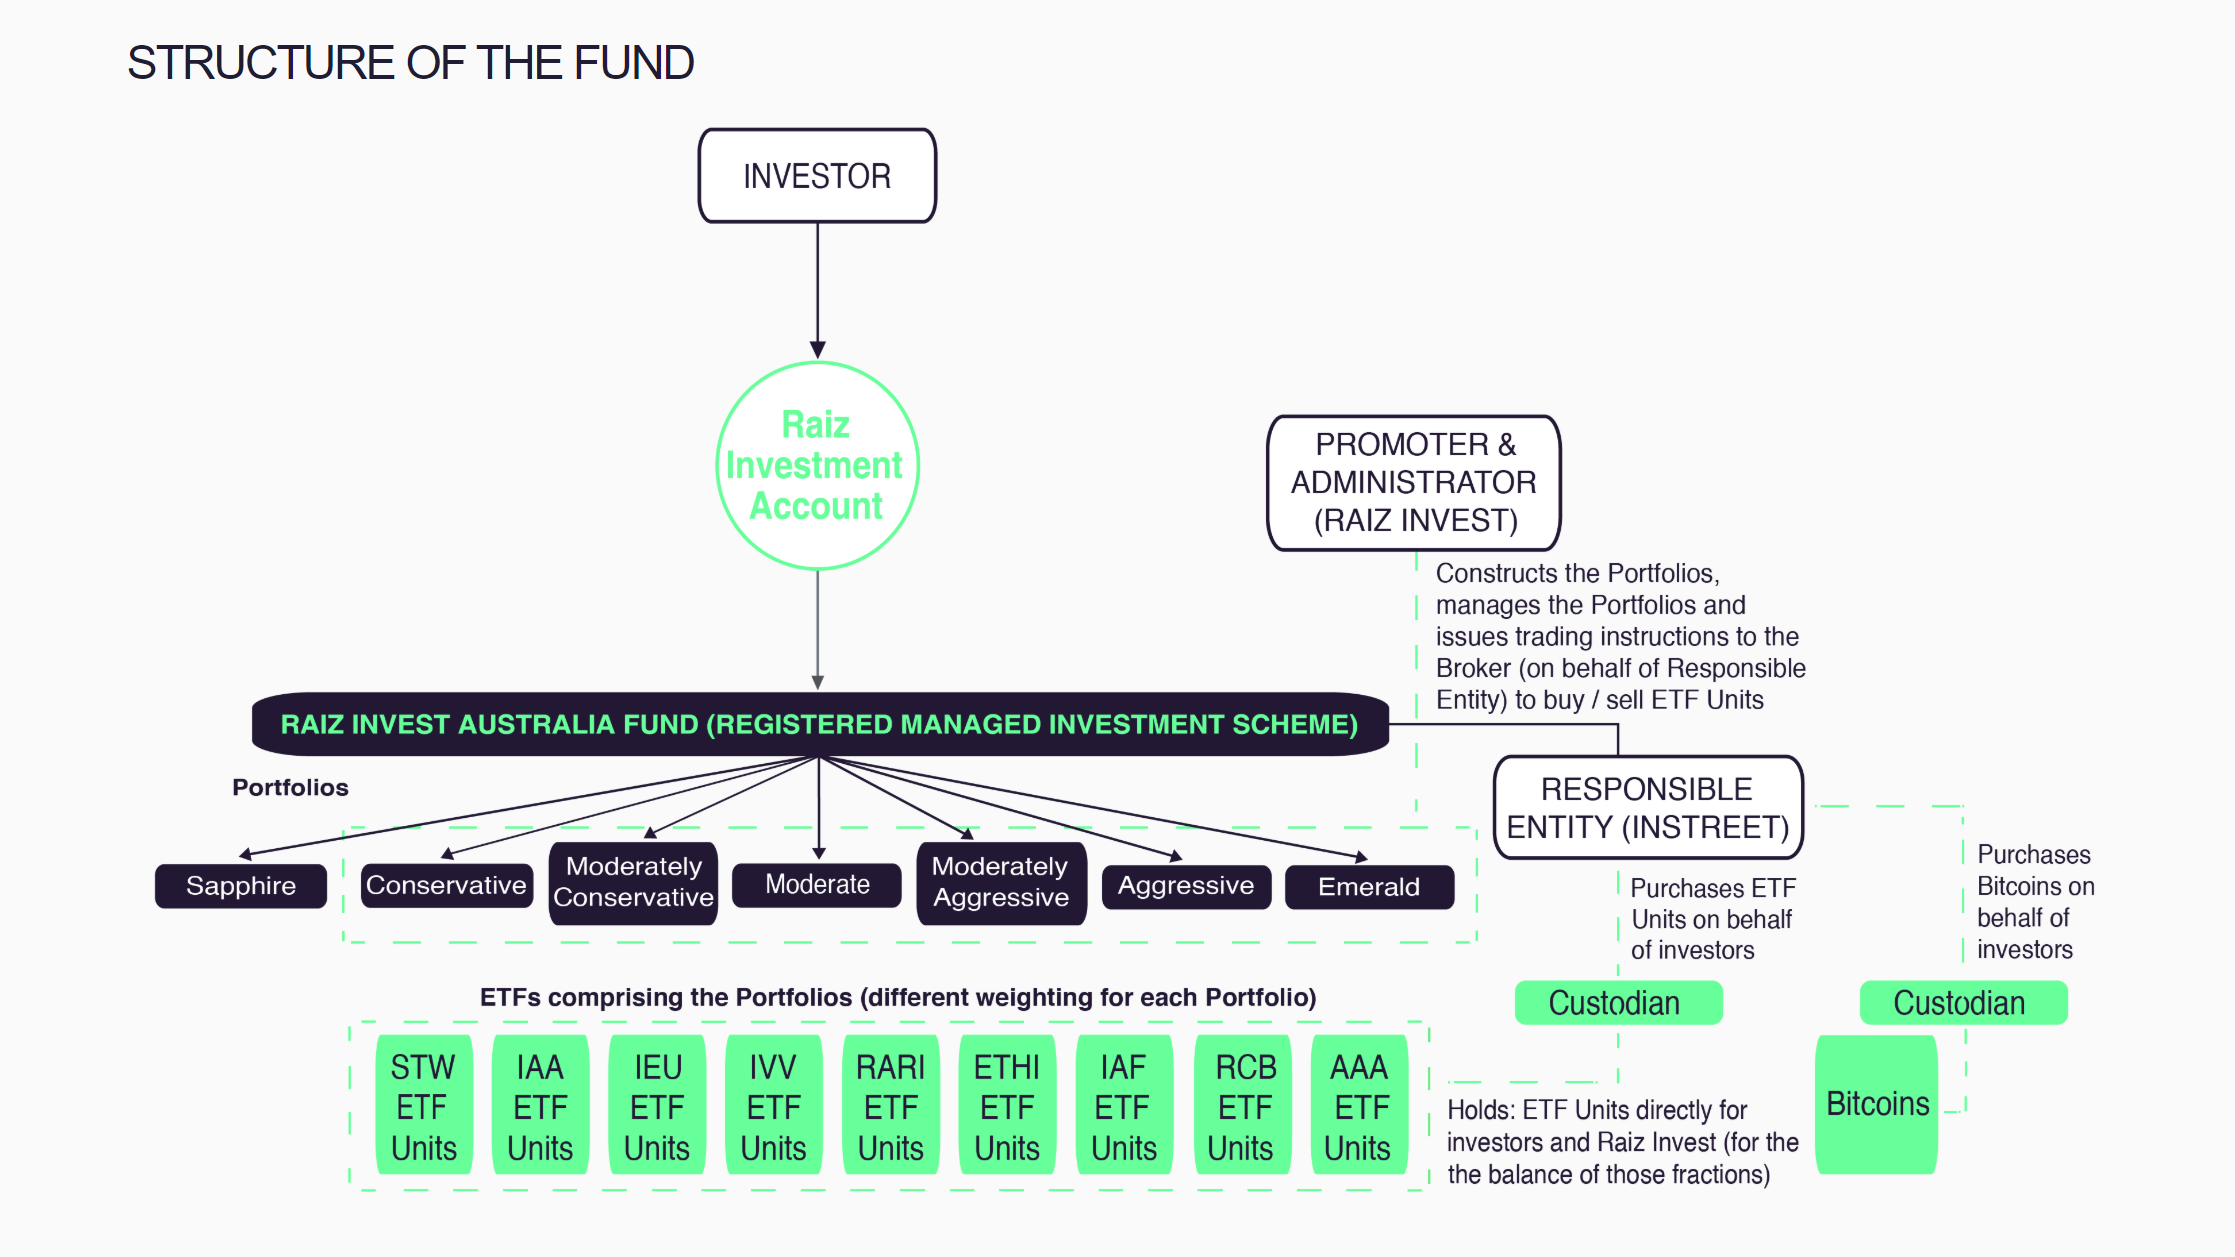 Aplicación líder de microinversión regulada en Australia Agrega la opción Bitcoin para inversores